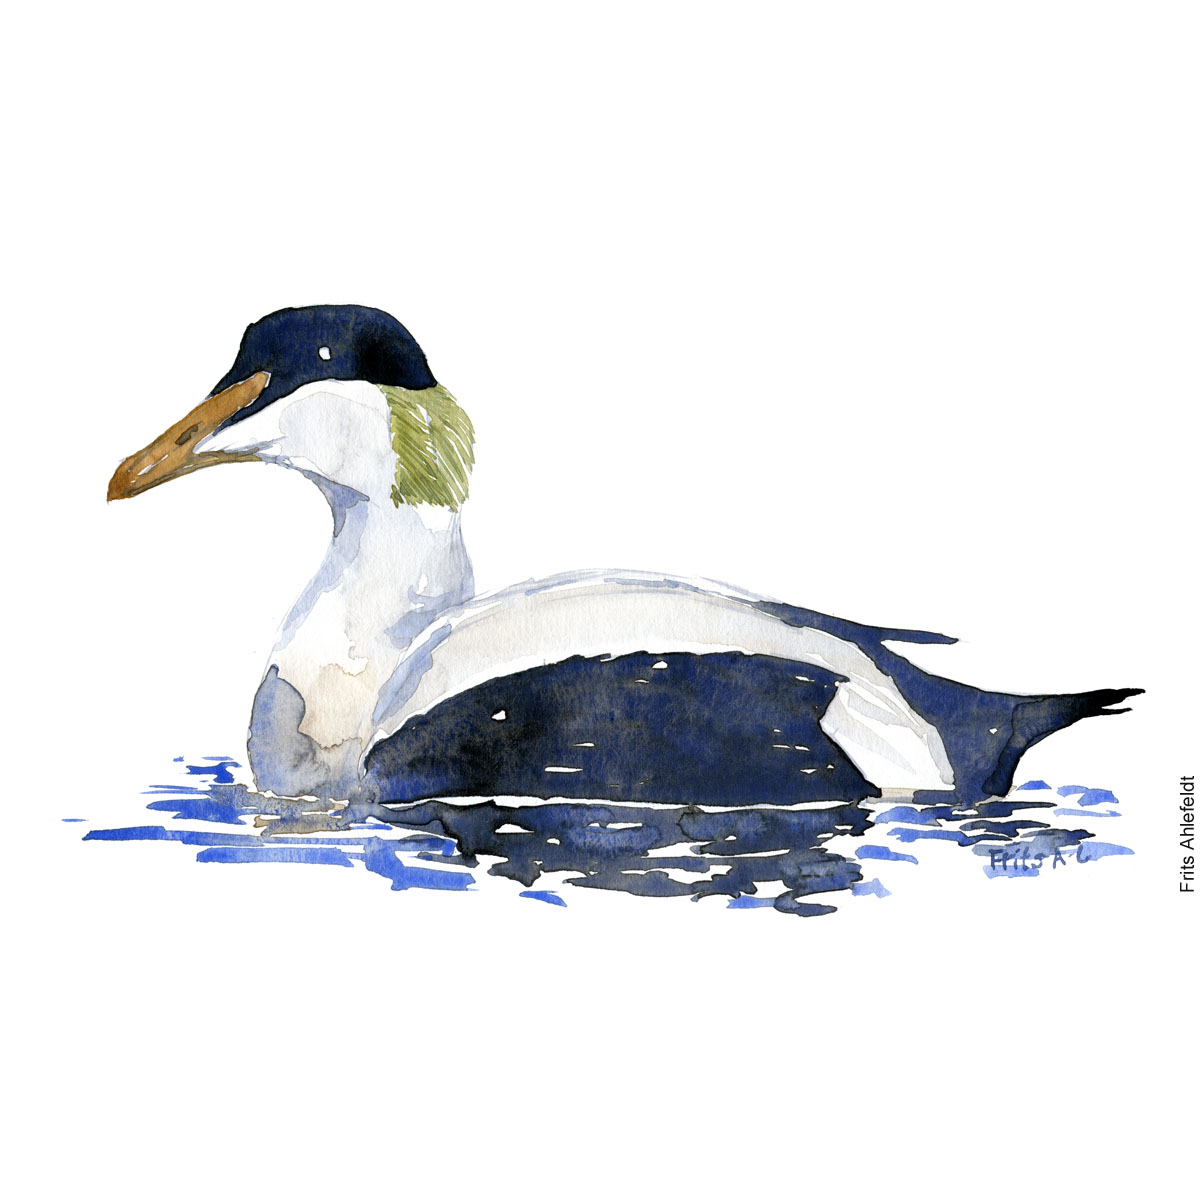 Edderfugl - Common eider bird watercolor painting. Artwork by Frits Ahlefeldt. Fugle akvarel